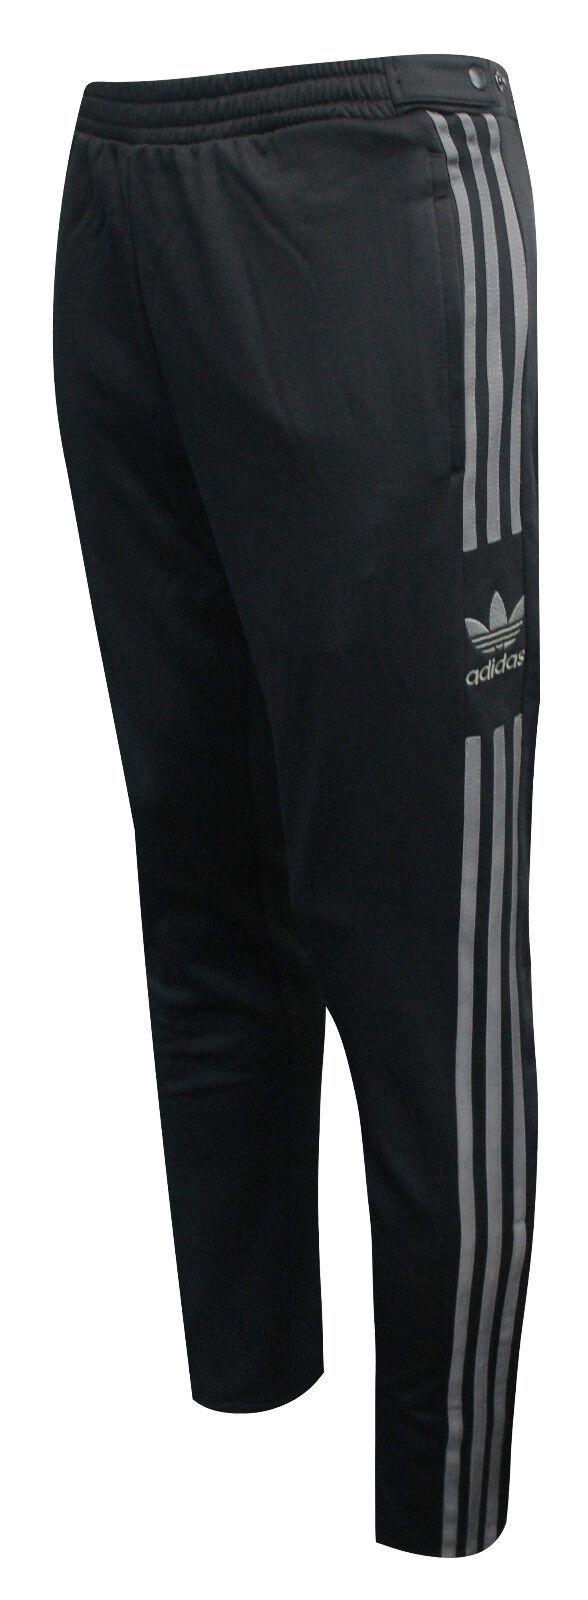 adidas id96 pants